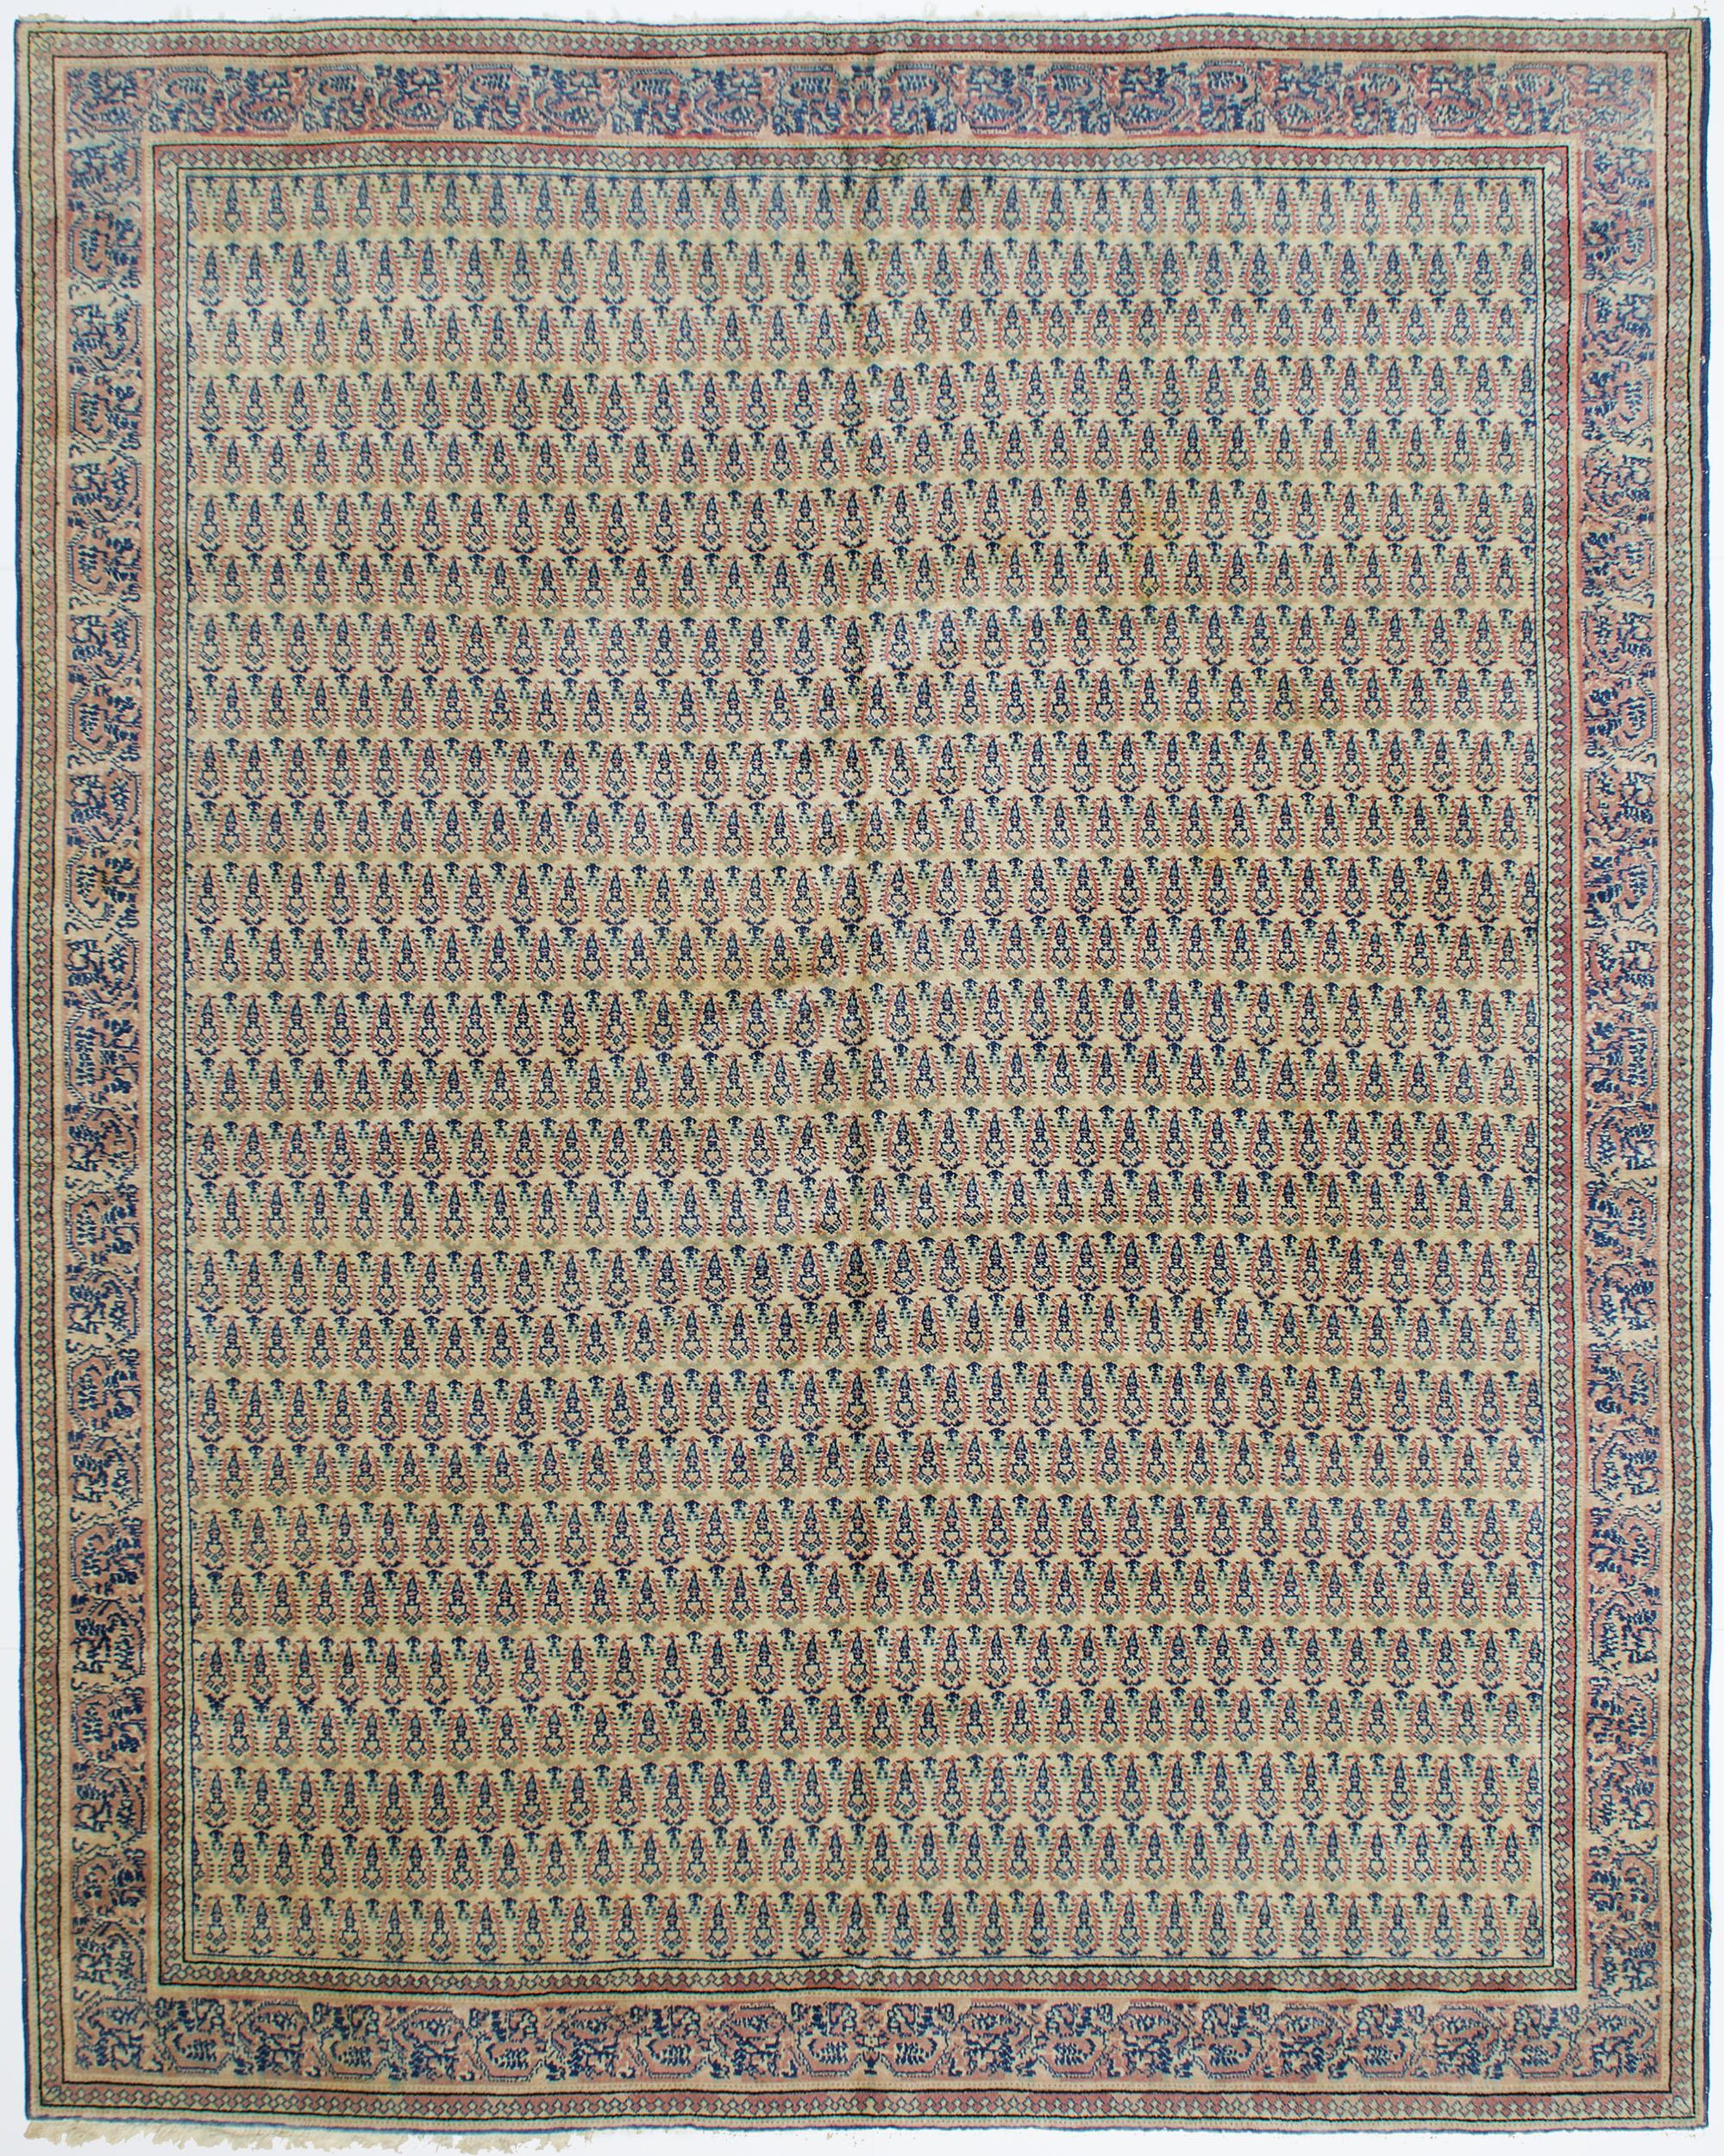 "Copy of Amritsar Carpet 9' 9"" x 7' 11"""